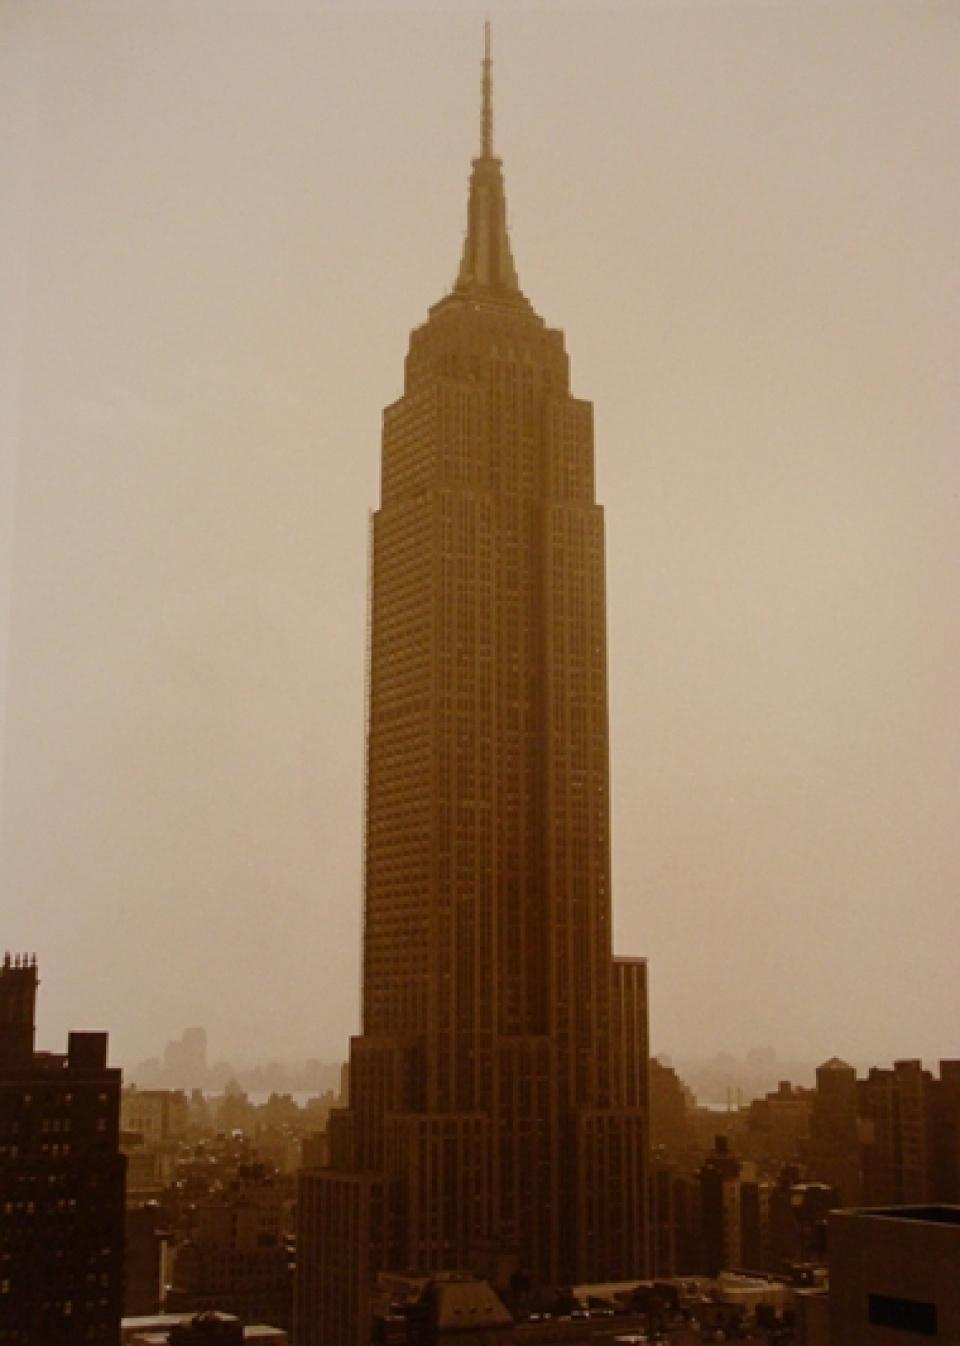 Barbara Mensch. Empire State Building